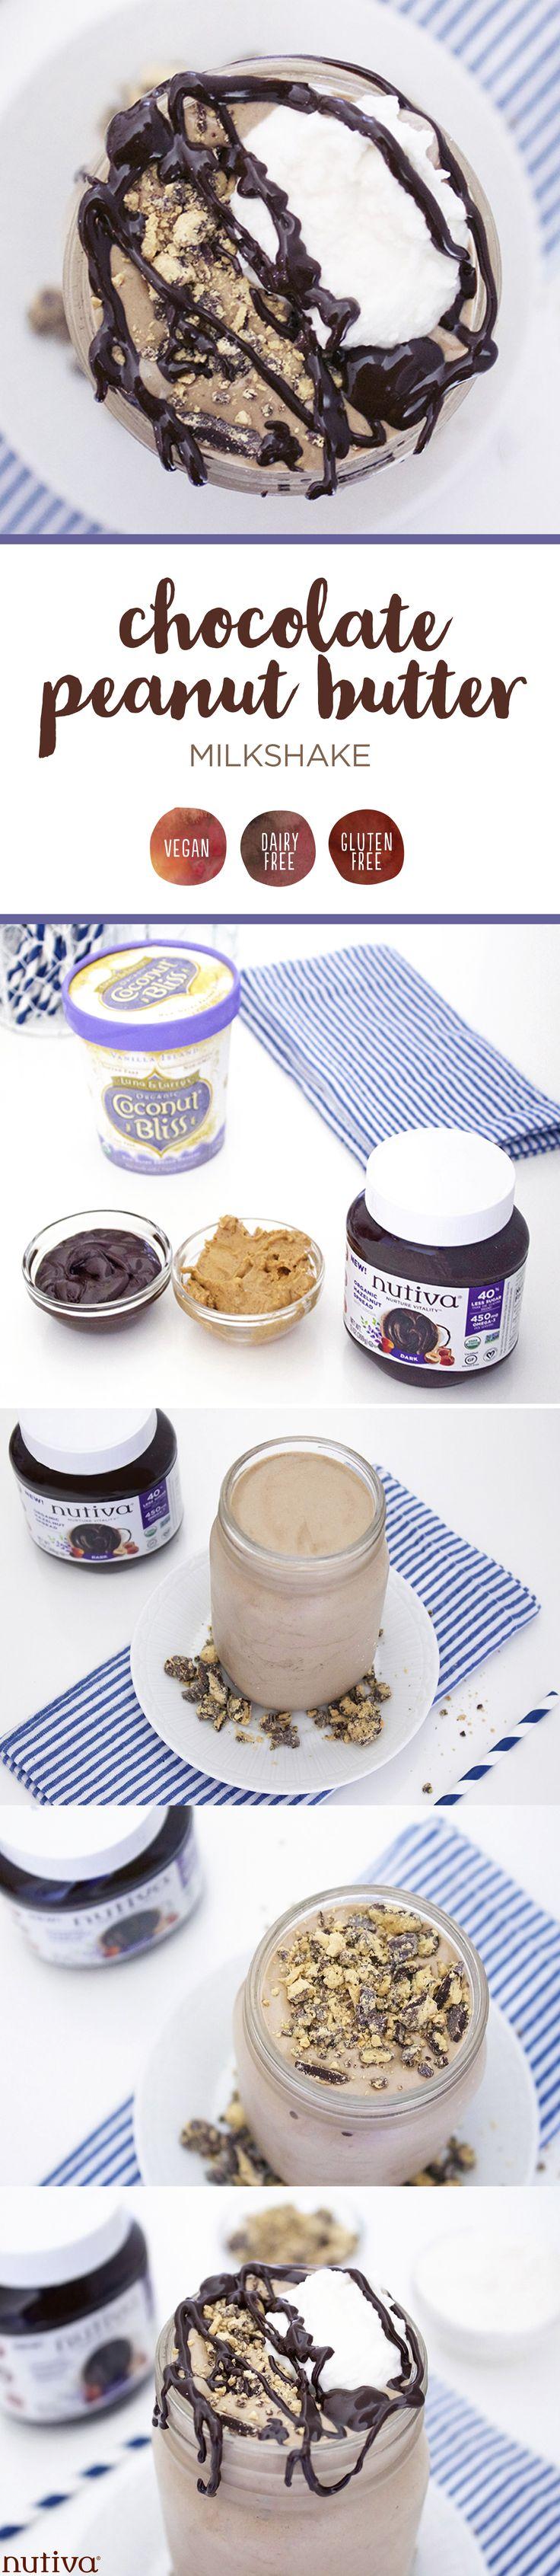 Chocolate Peanut Butter Milkshake kitchen.nutiva.com